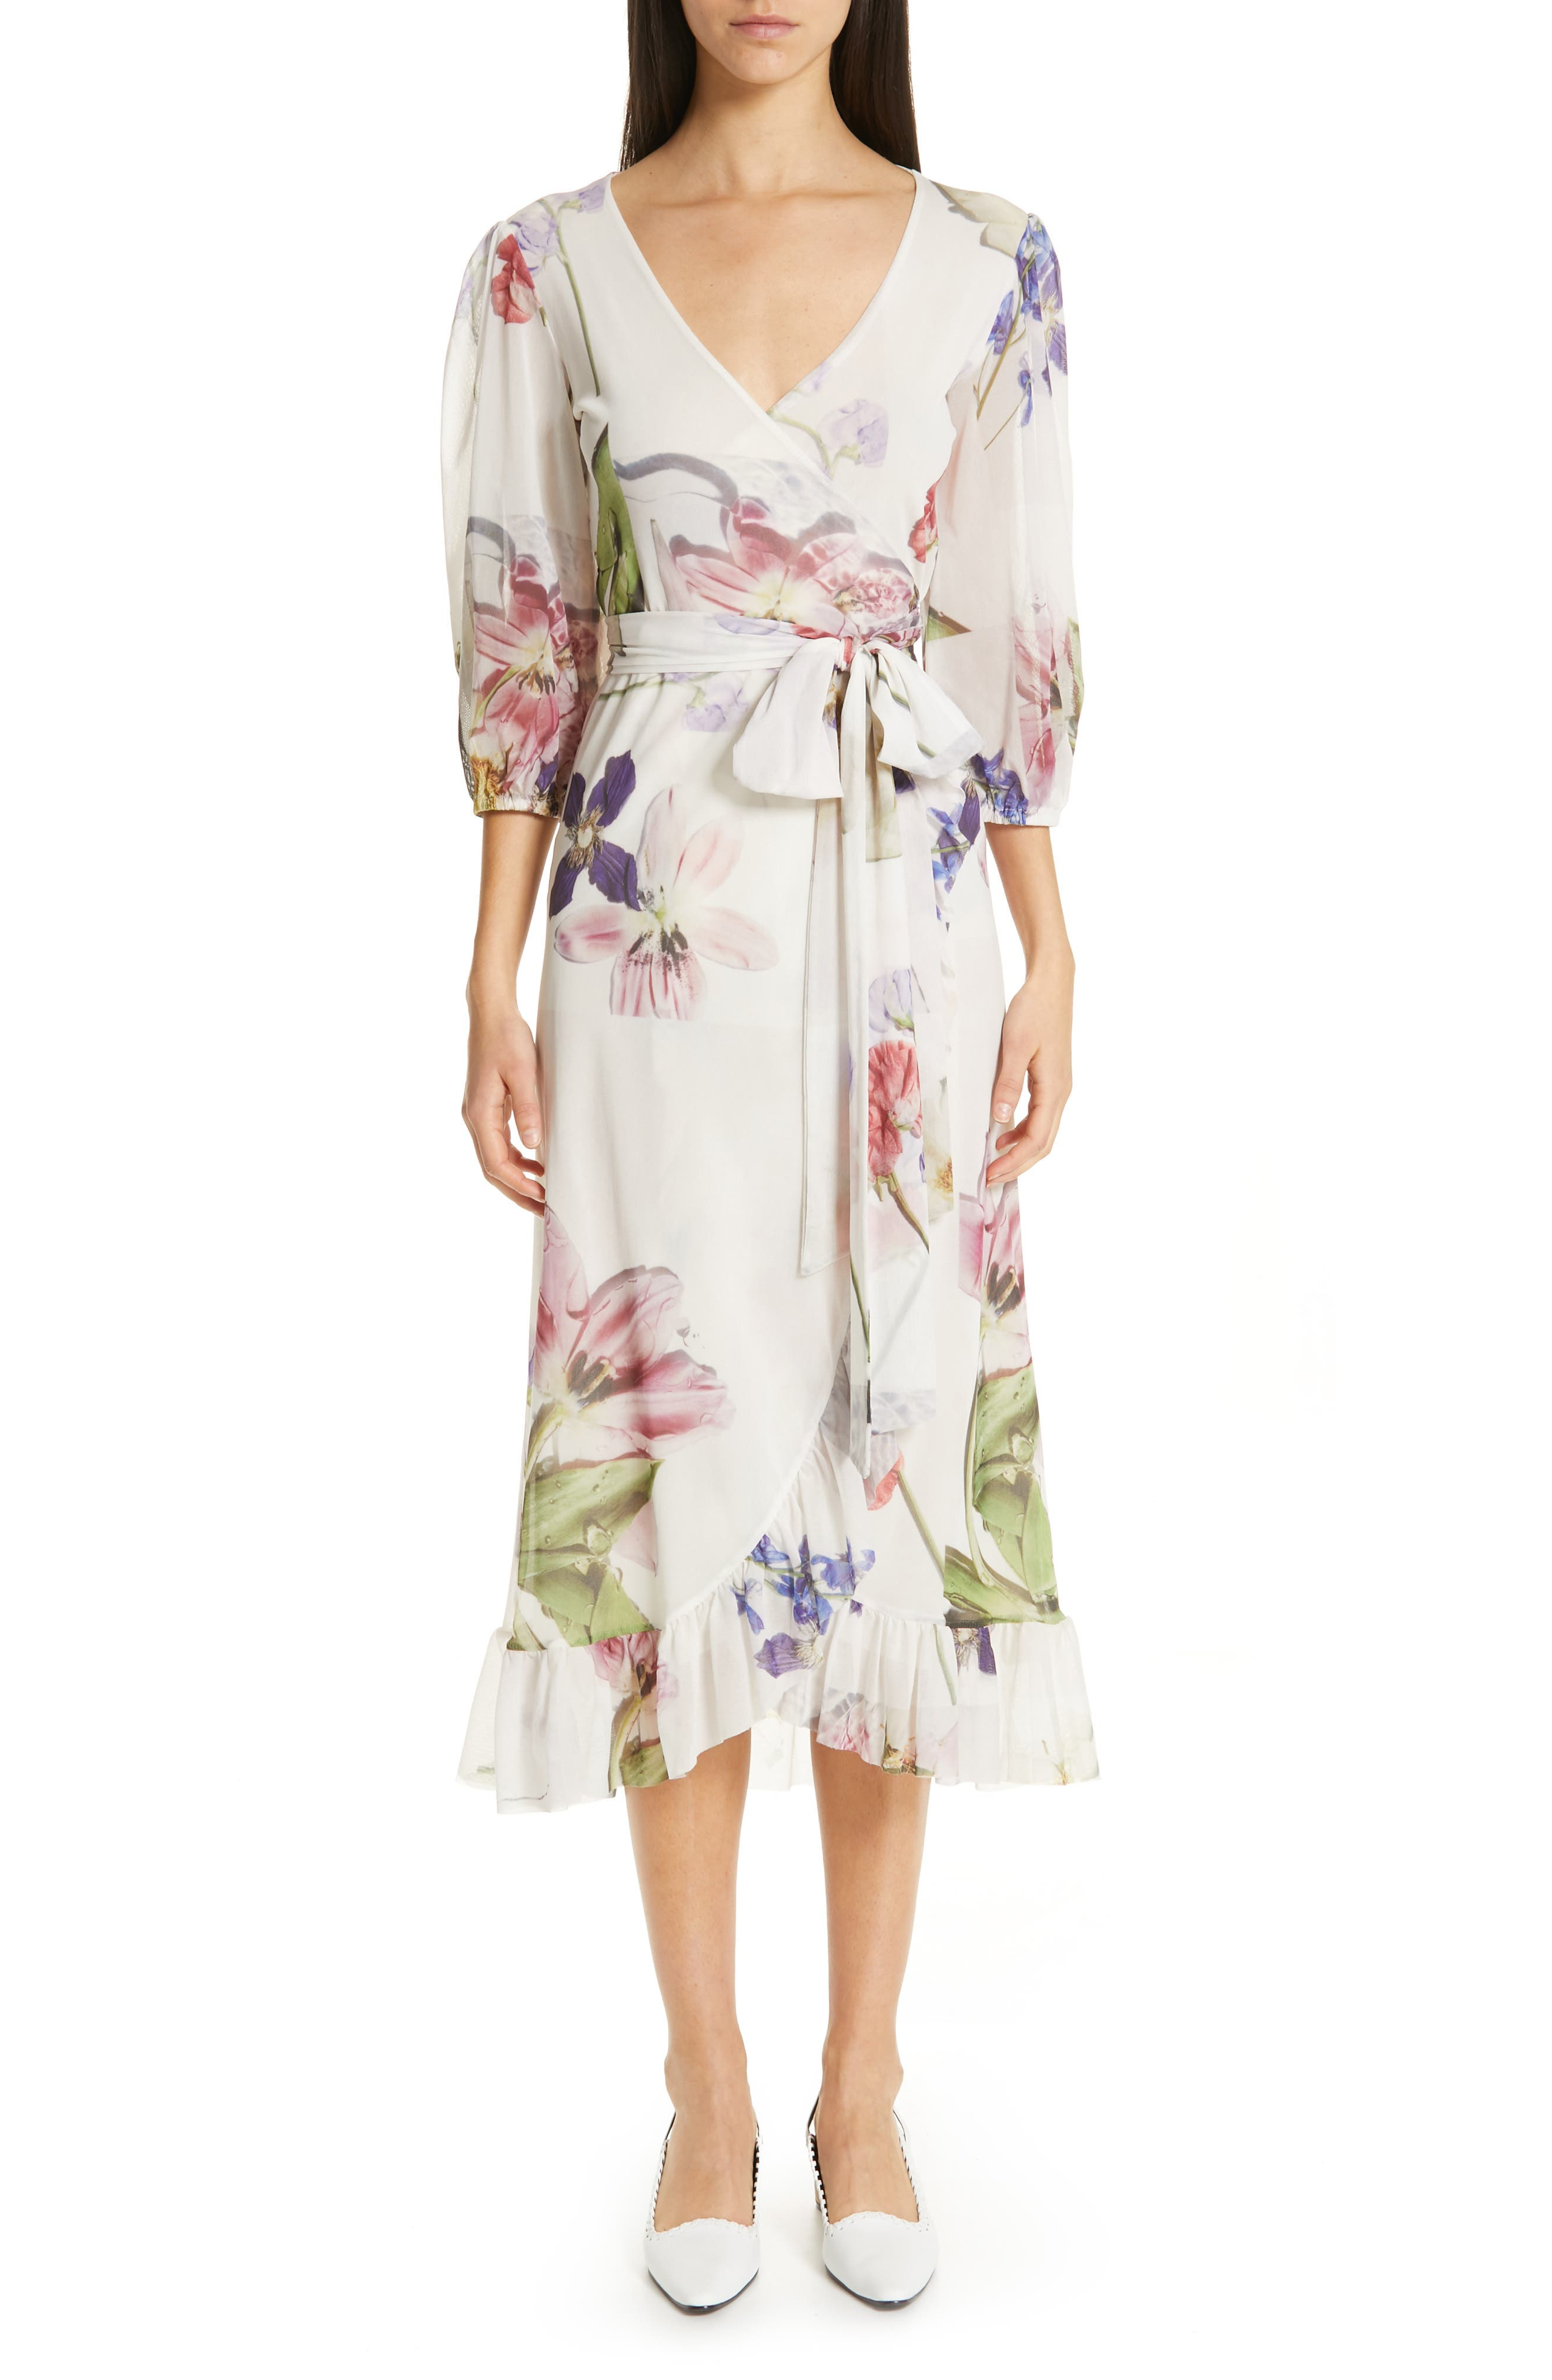 GANNI Floral Print Mesh Dress, Main, color, BRIGHT WHITE